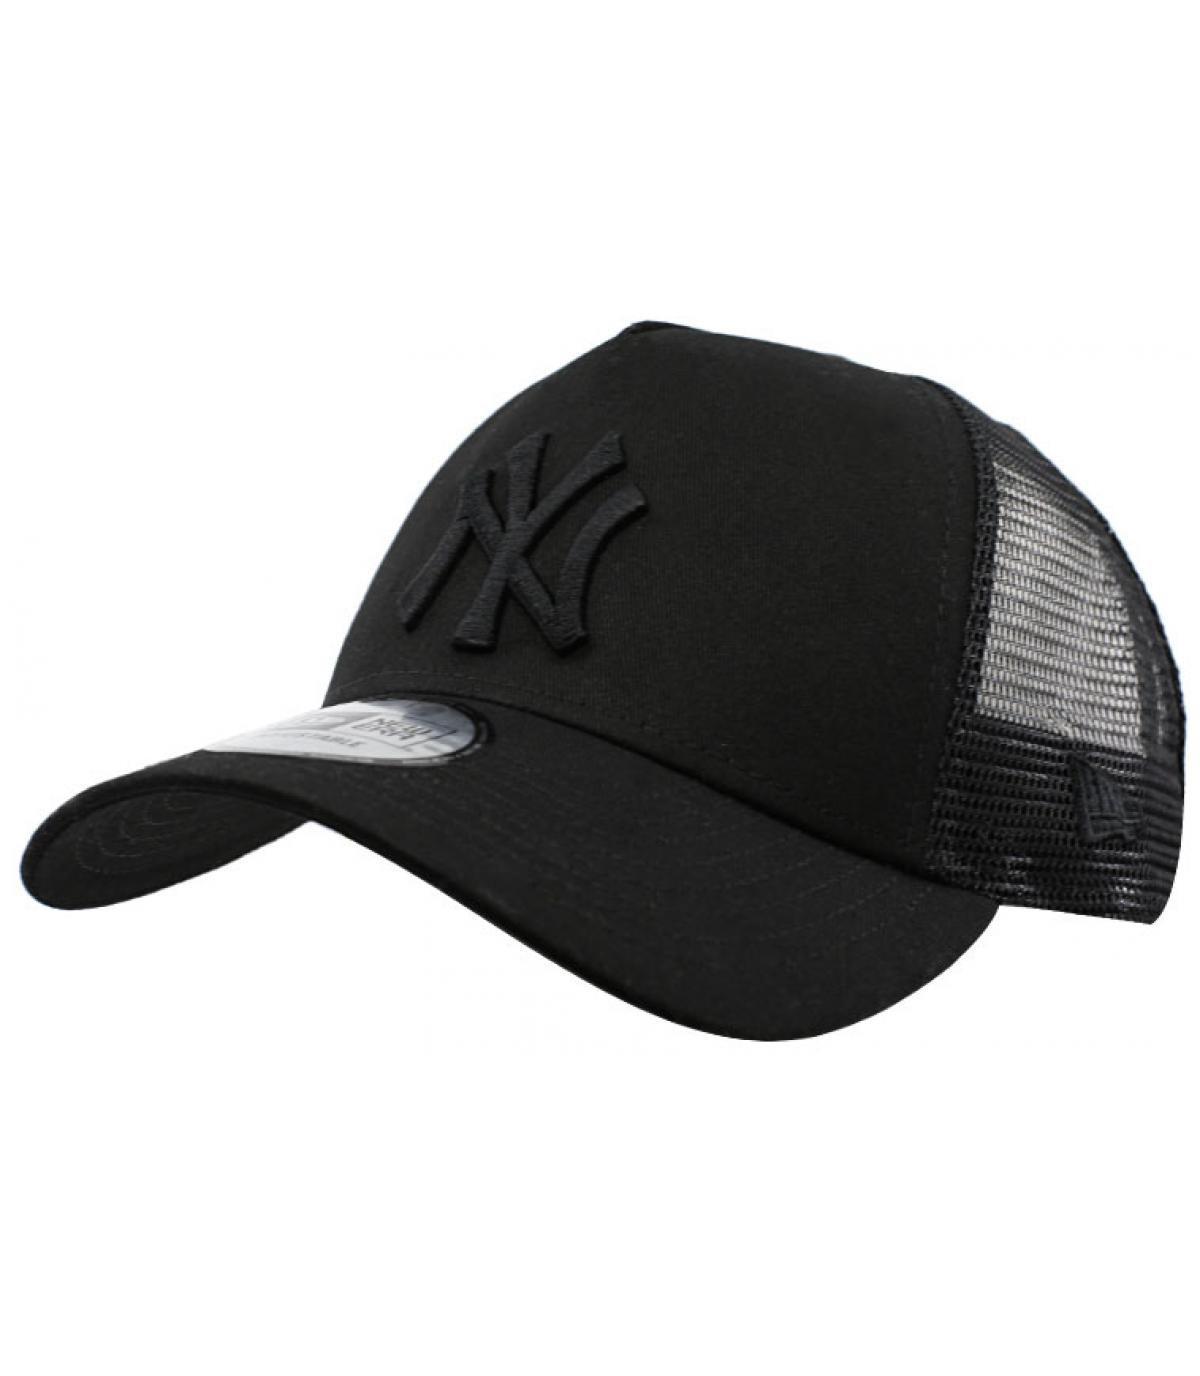 Dettagli Trucker League Ess NY black black - image 2